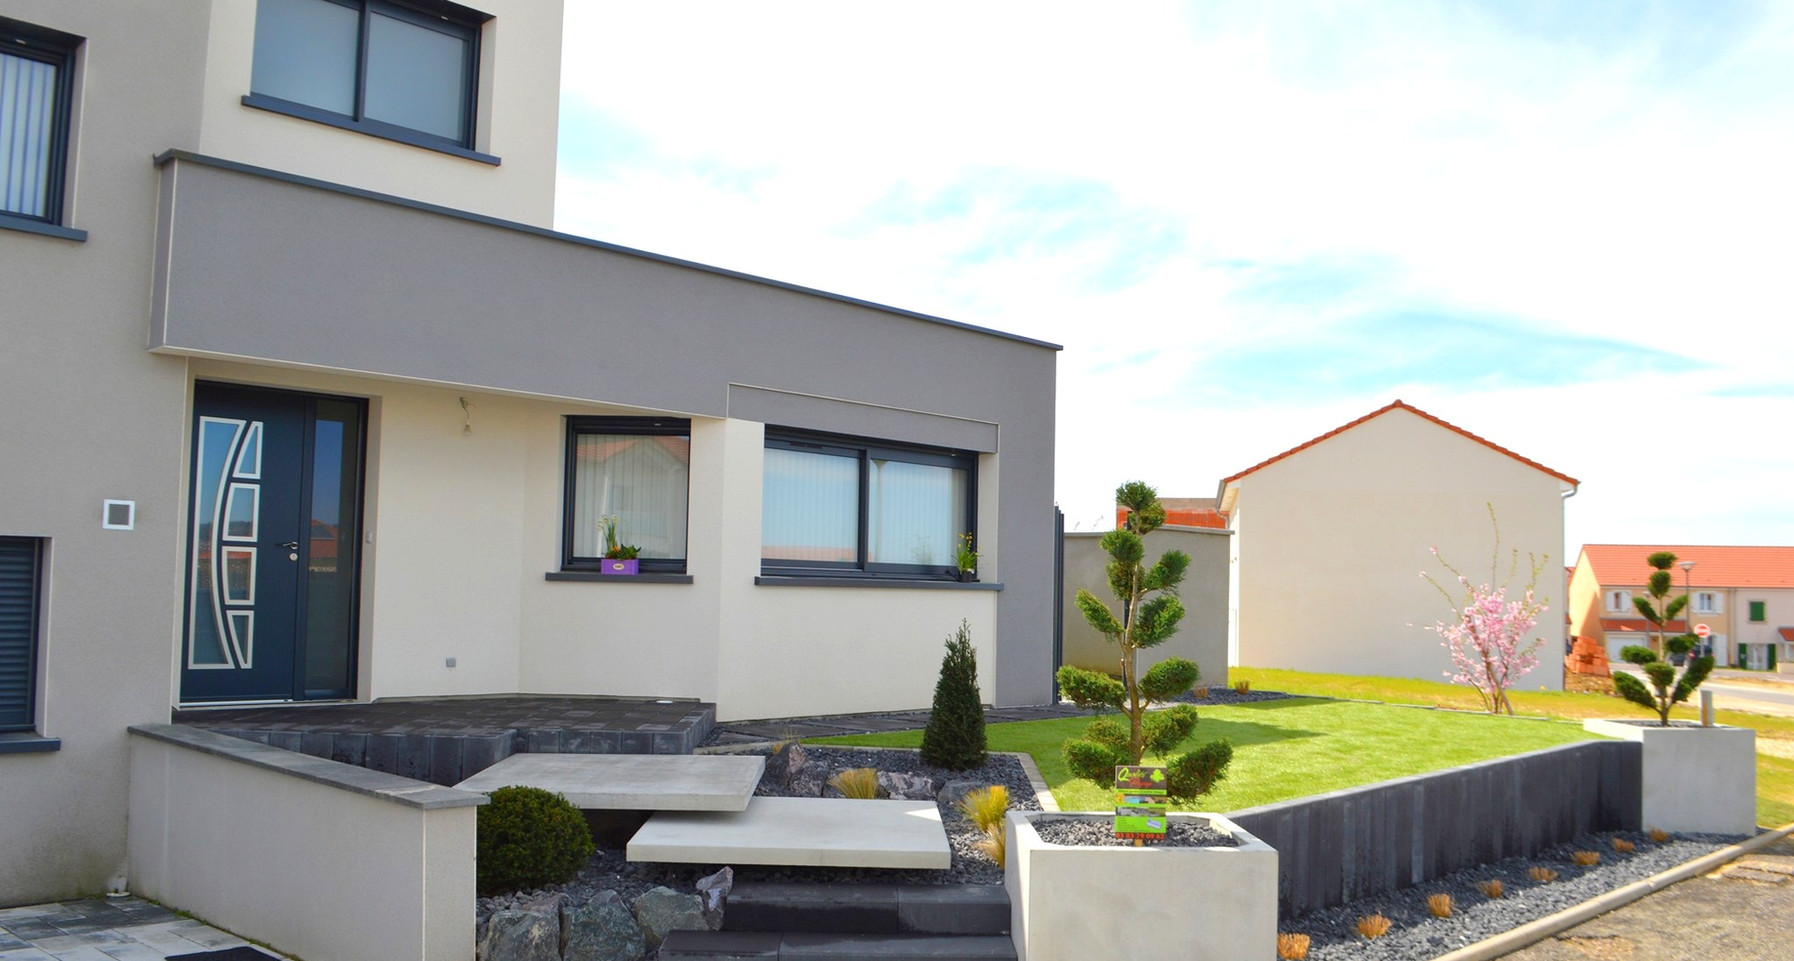 escalier-maison-qualite-paysage-1a_edite